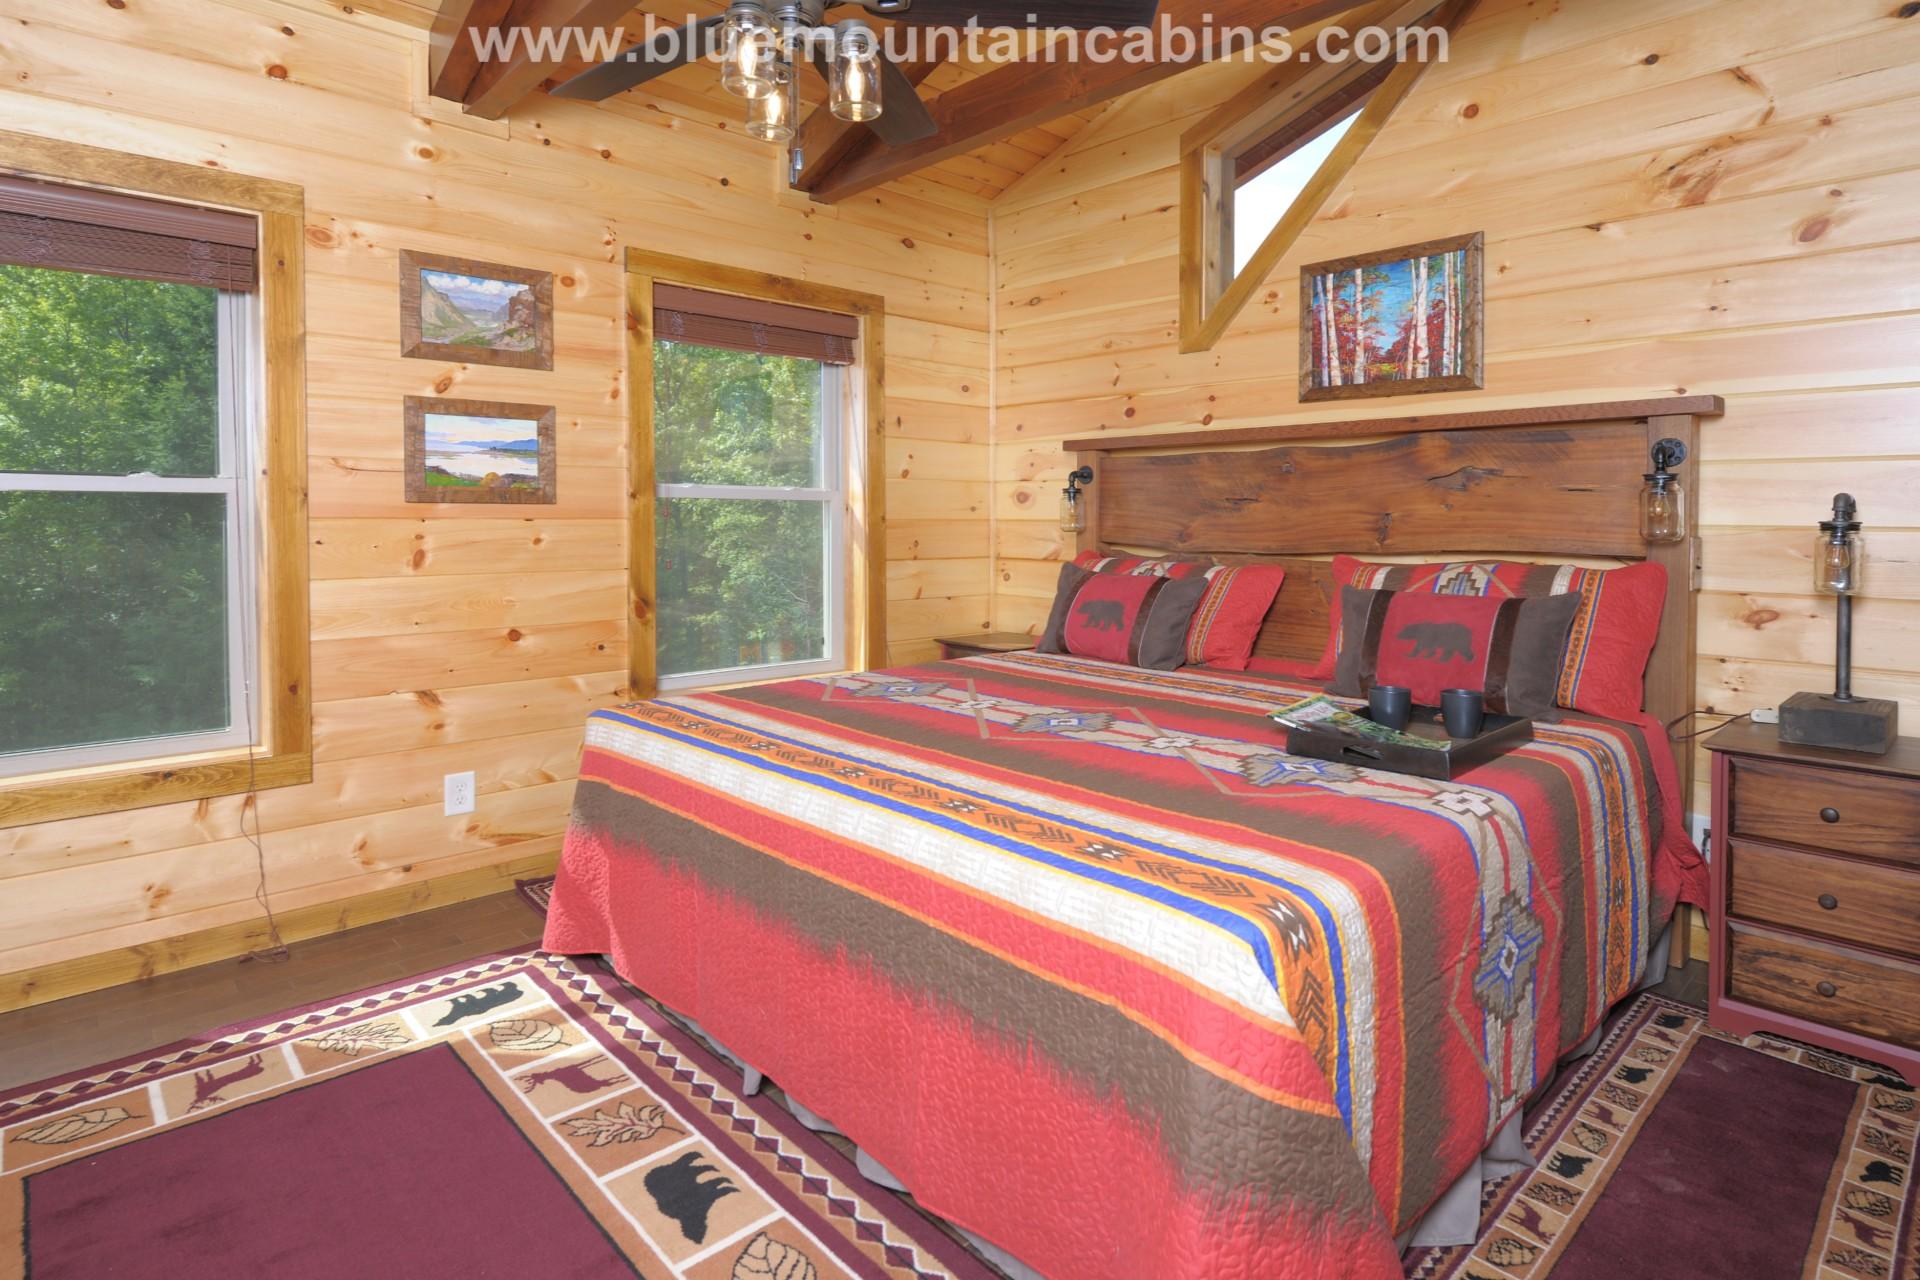 Ridge view lodge gatlinburg cabin upscale decor